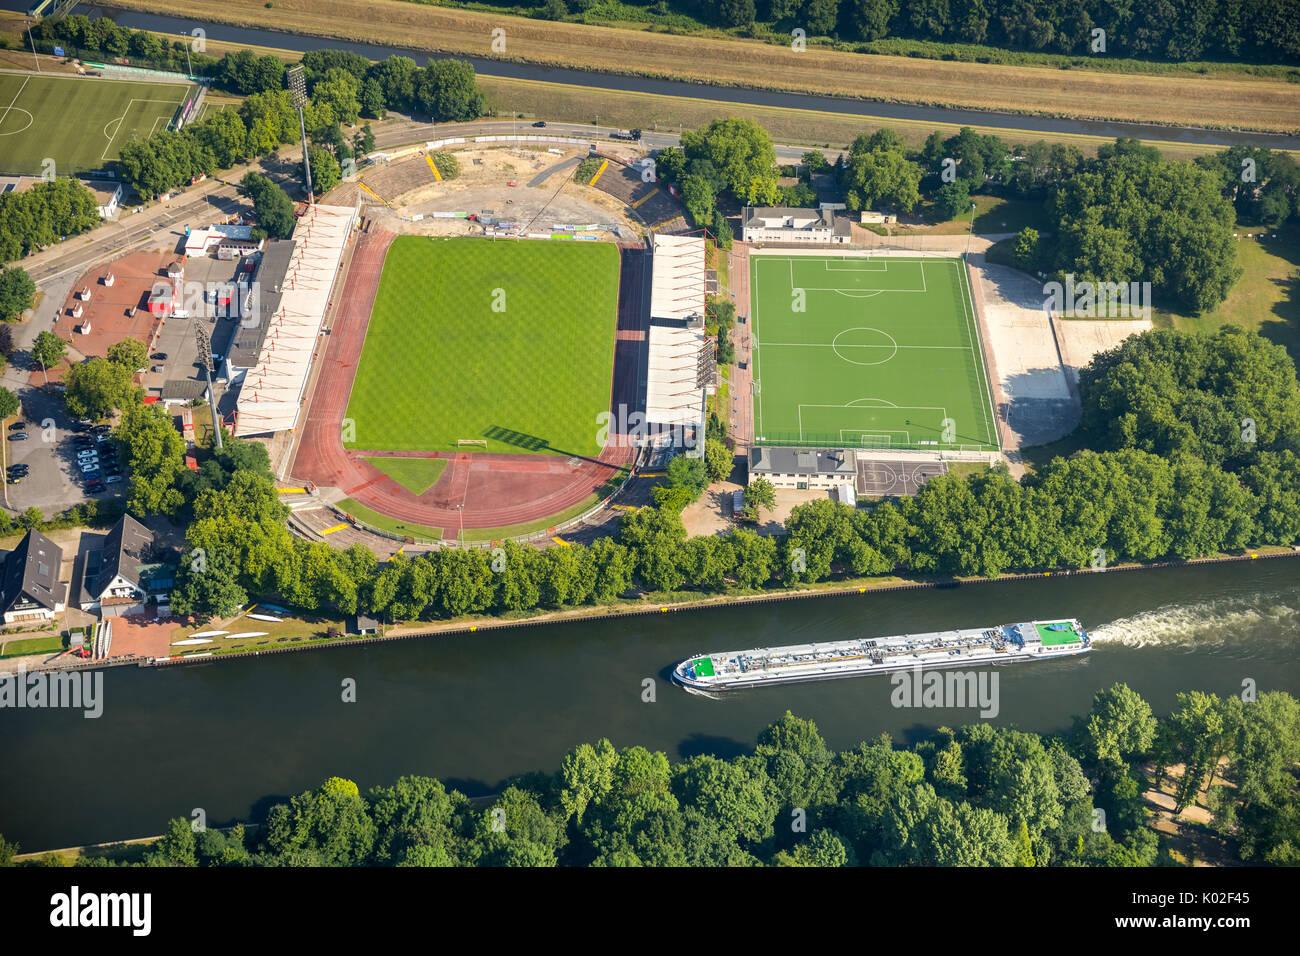 Stadion Niederrhein, new North Stand, sports and leisure facility SSB, Emscher area north of Stadiona, Oberhausen, Ruhr area, North Rhine-Westphalia,  - Stock Image